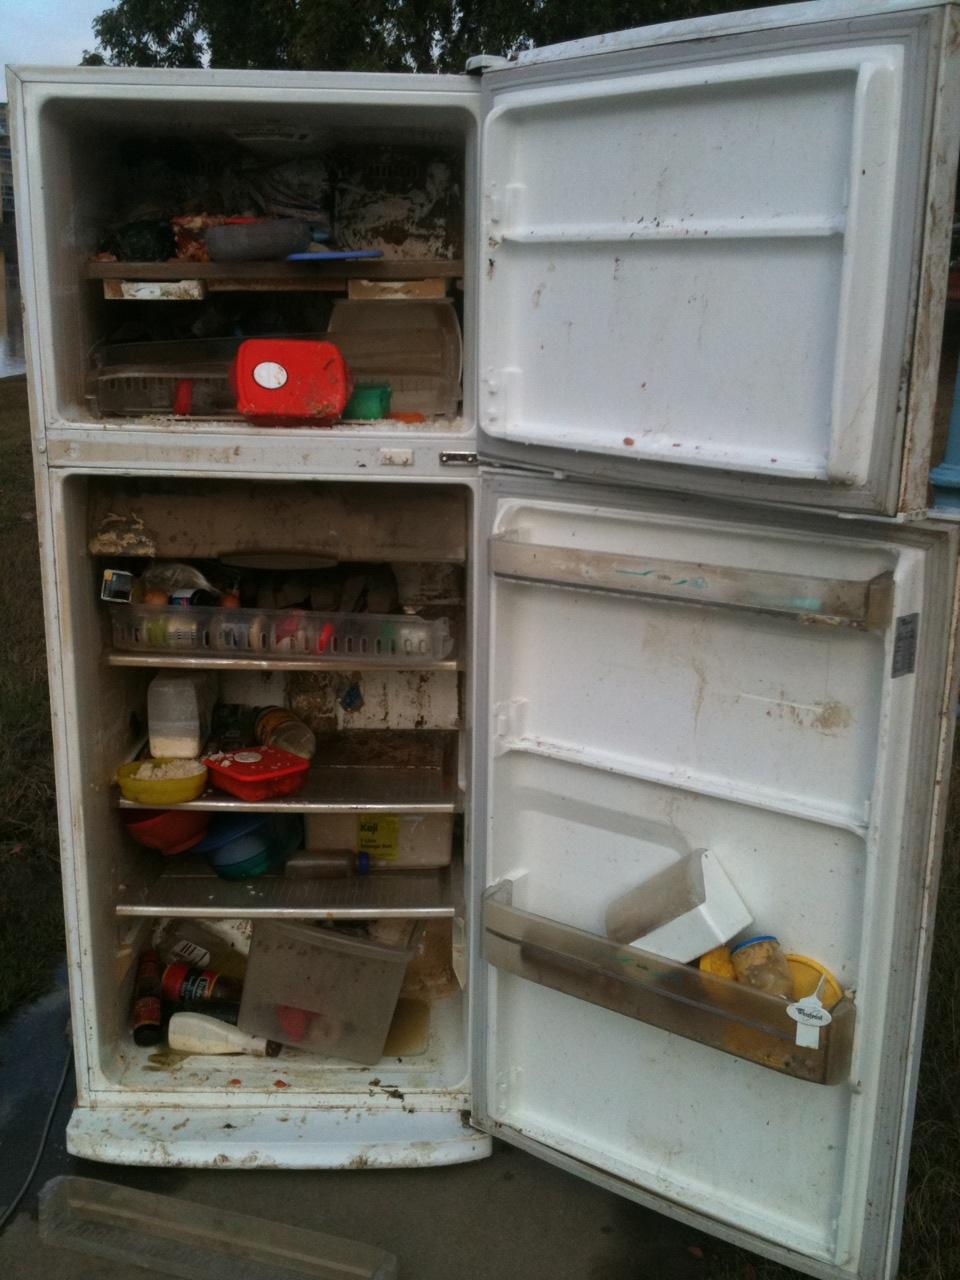 how to clean mold in mini fridge